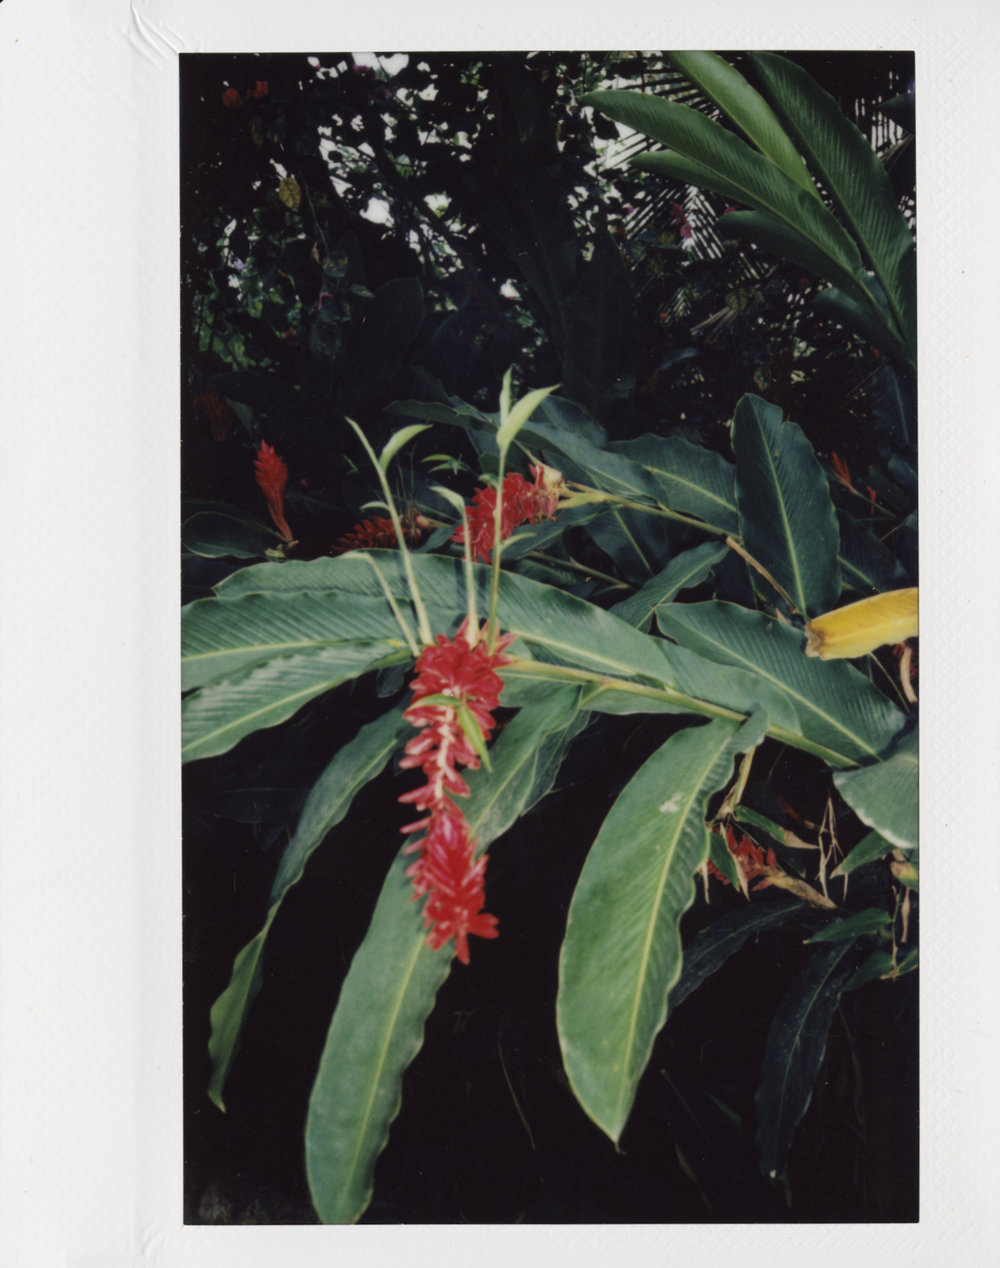 Colombia_Flower_05.jpg